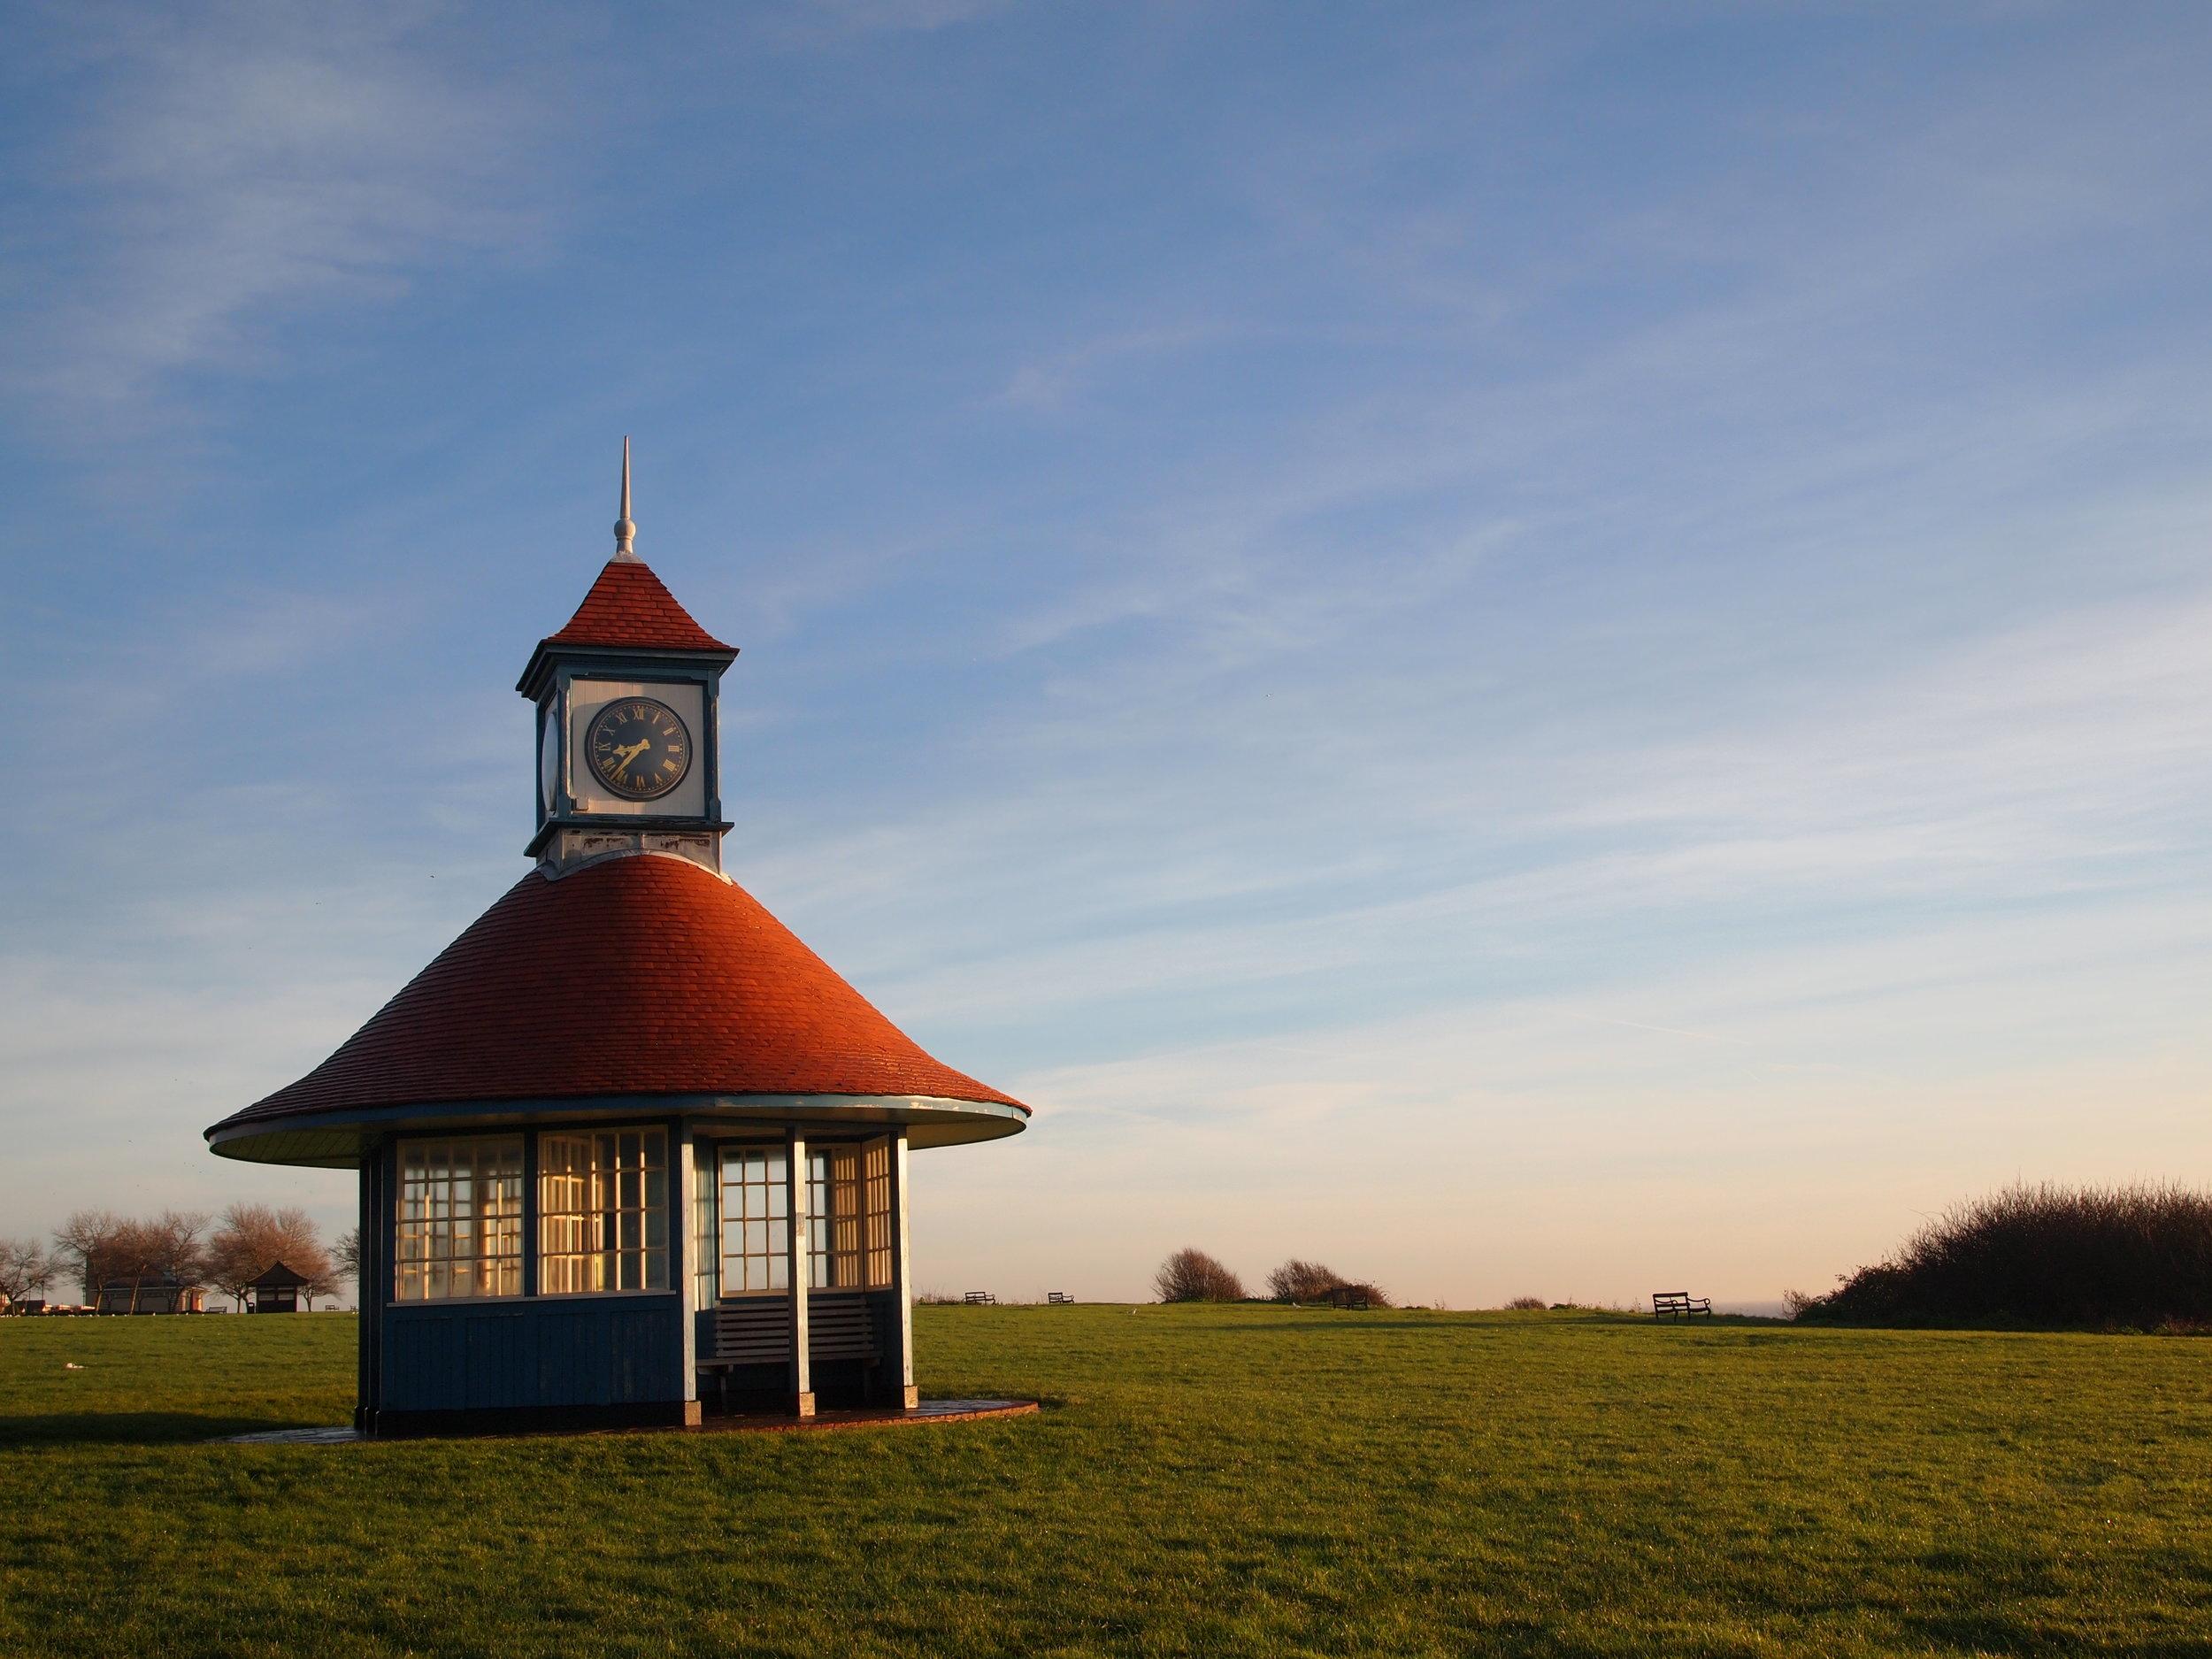 Frinton Clock Tower